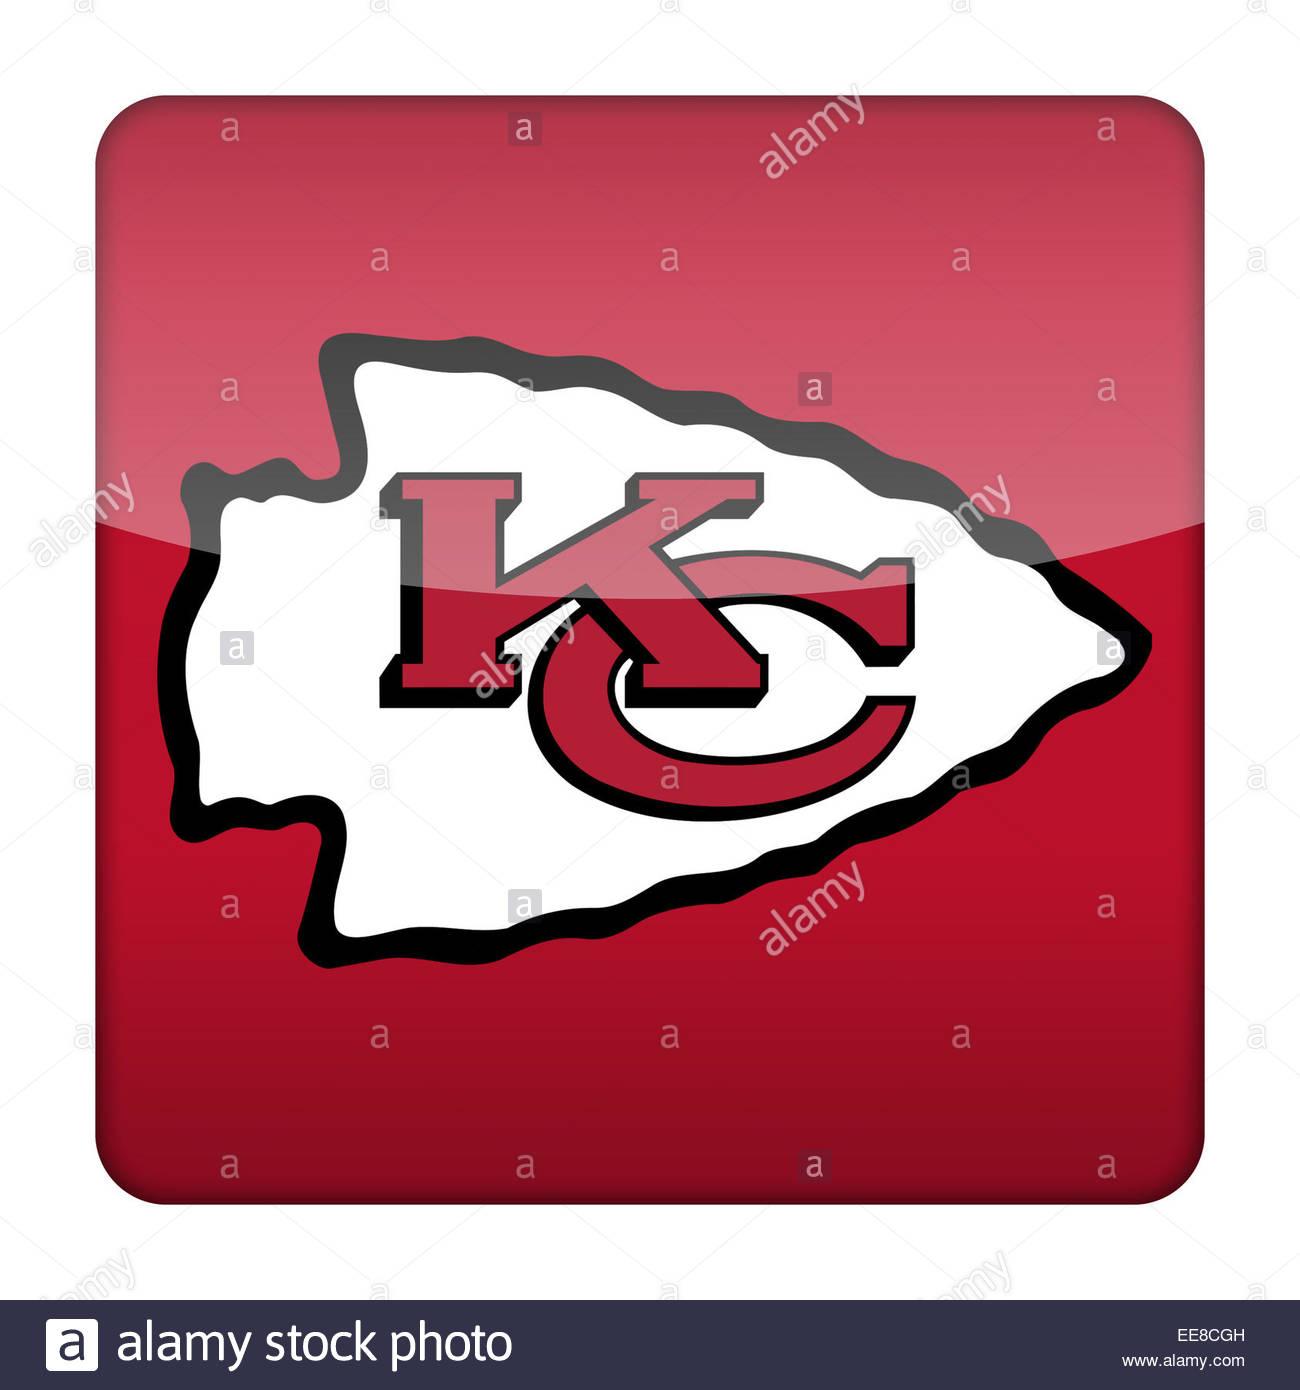 Kansas City Chiefs Cut Out Stock Images Pictures Alamy